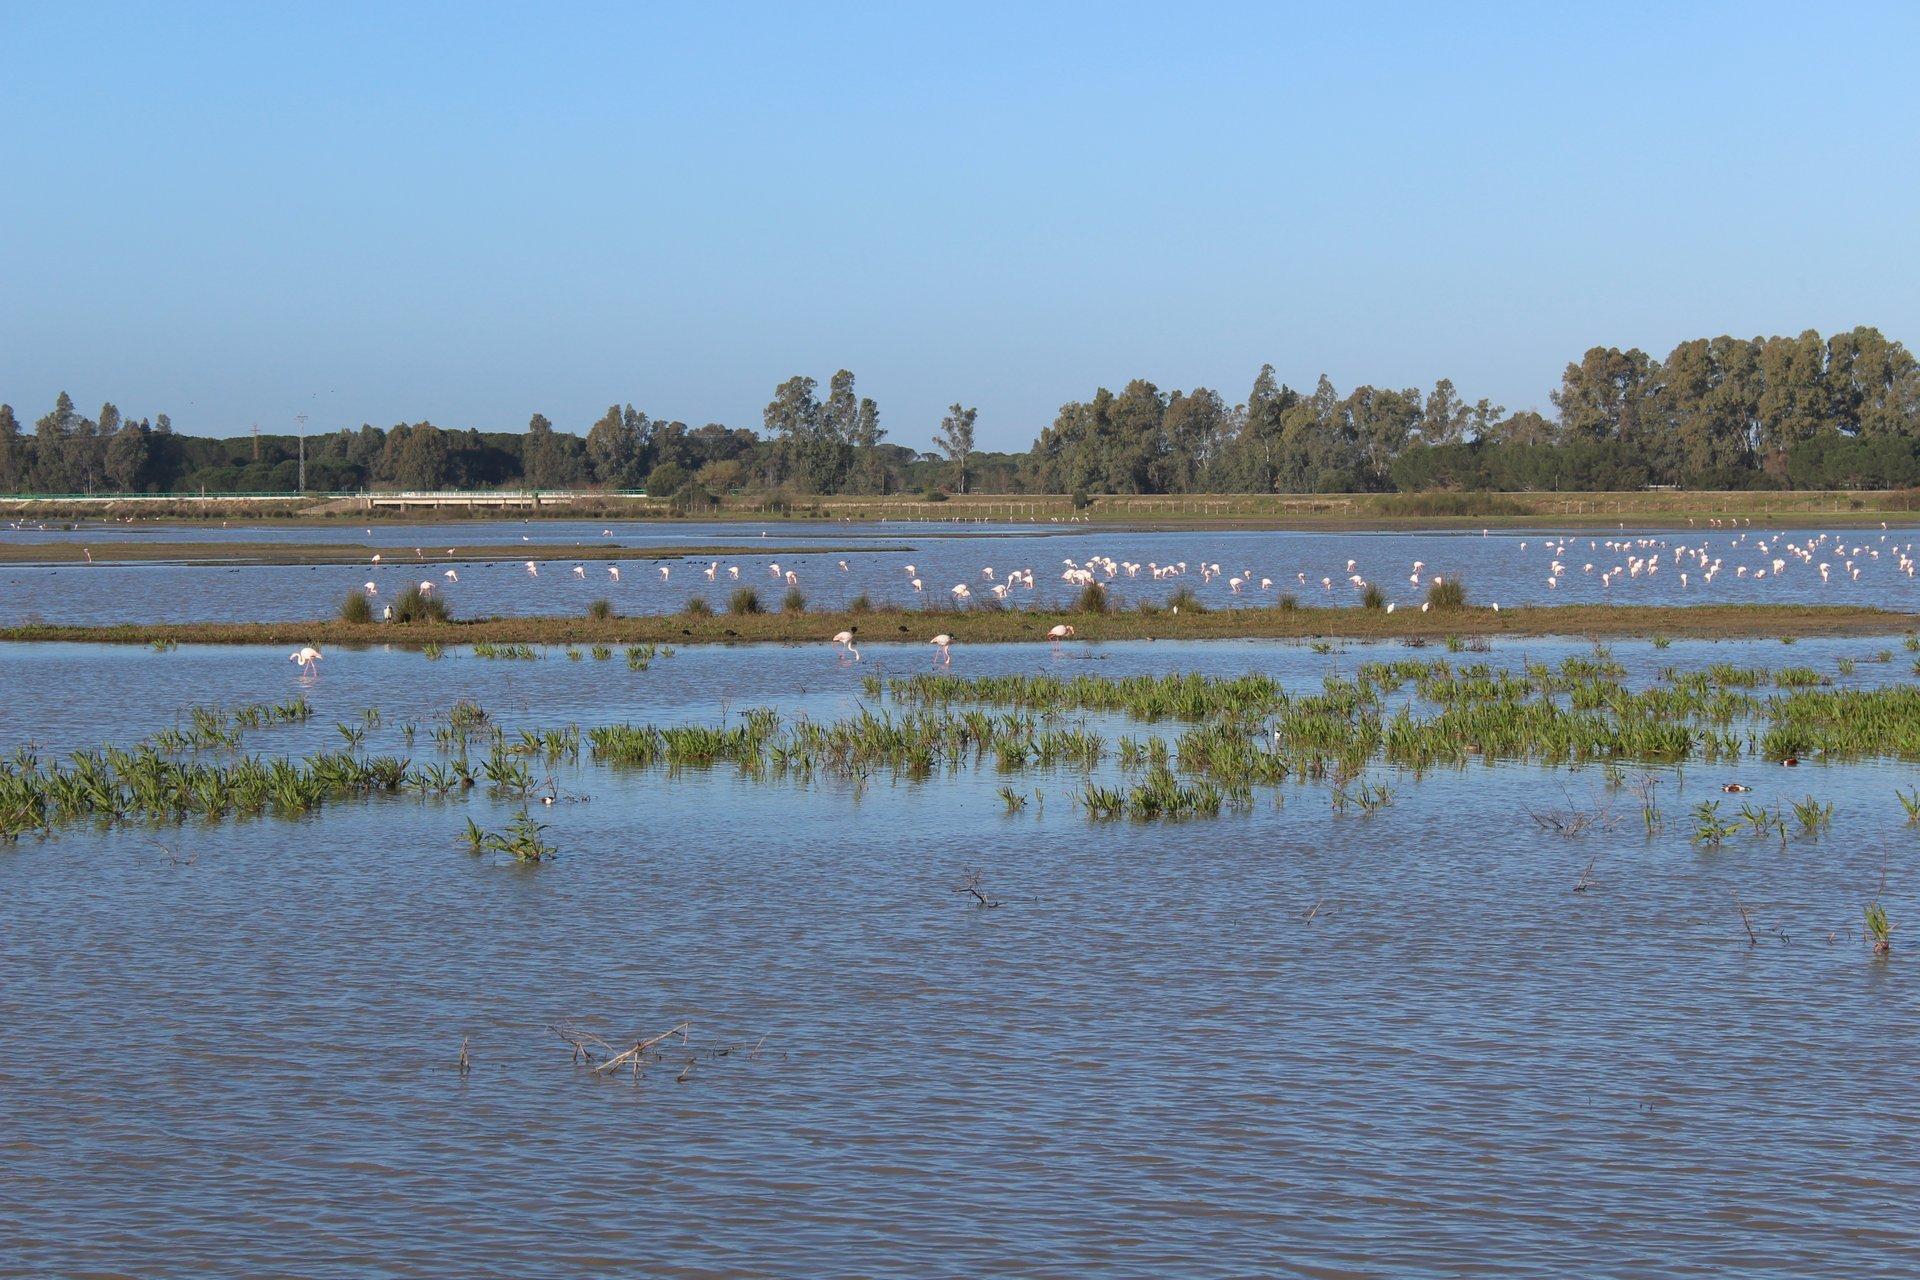 Flamingos in Doñana National Park 2020